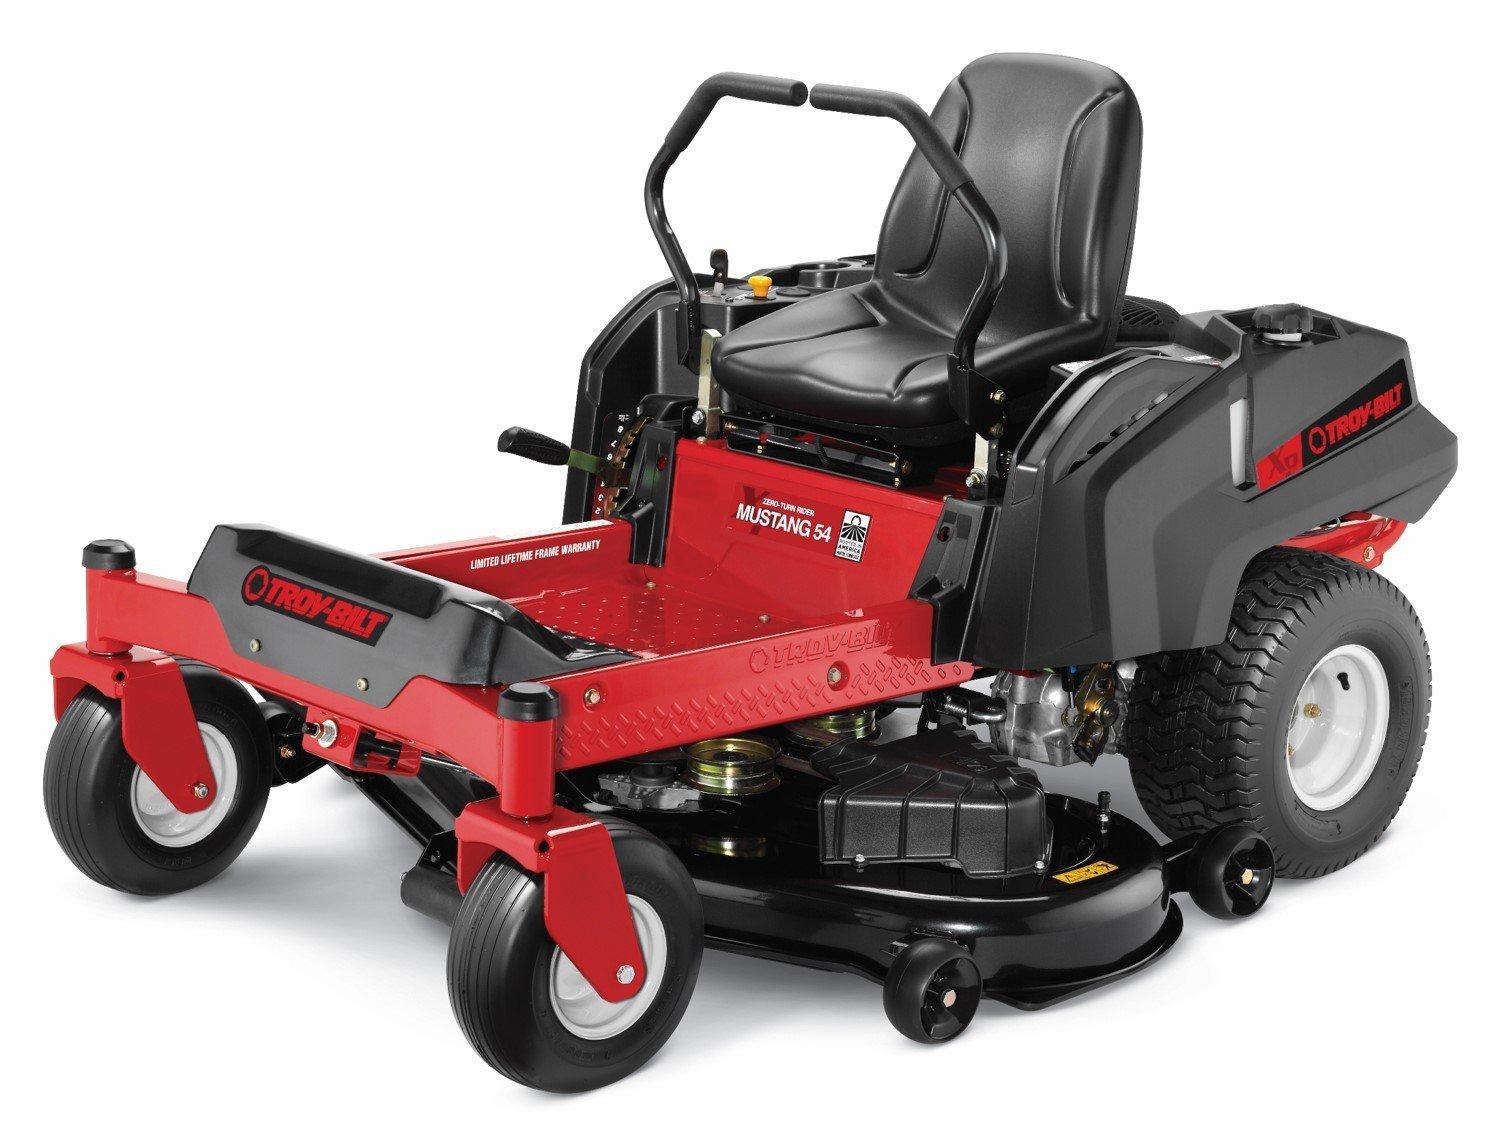 Zero Turn Garden Tractor : Snapper riding lawn mower zero turn zt review